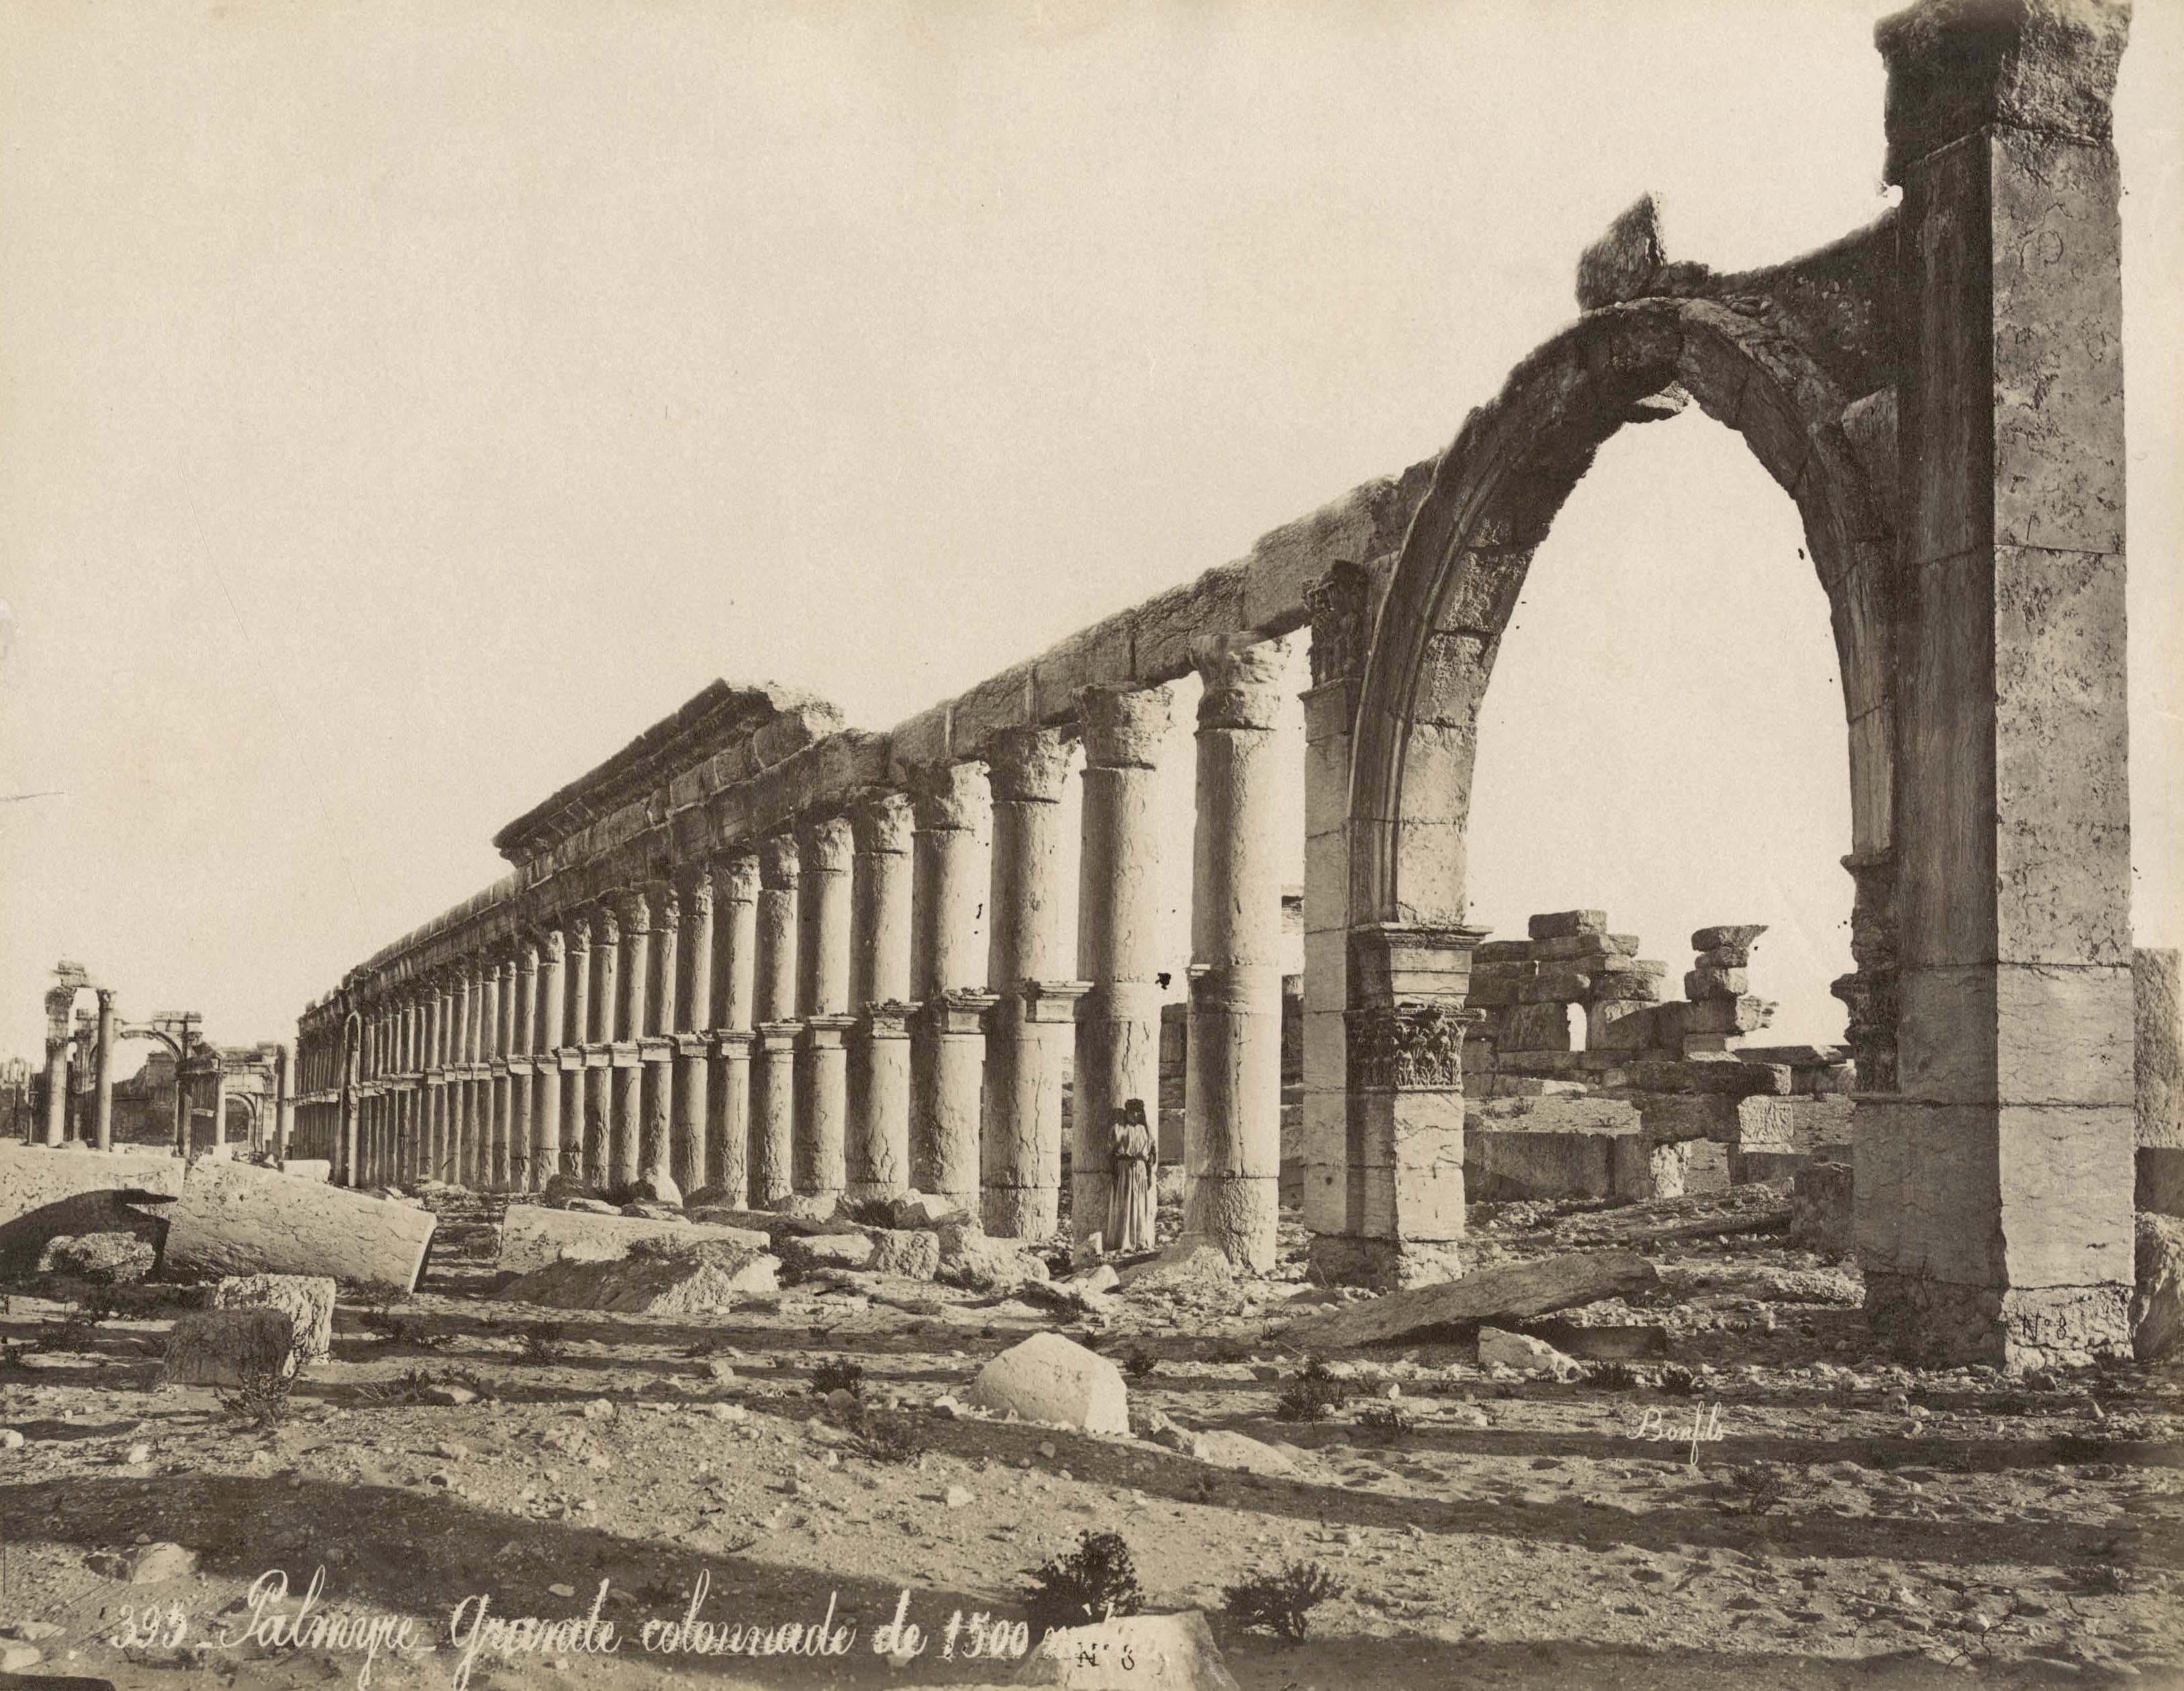 ANCIENT PALMYRA PHOTOGRAPHS